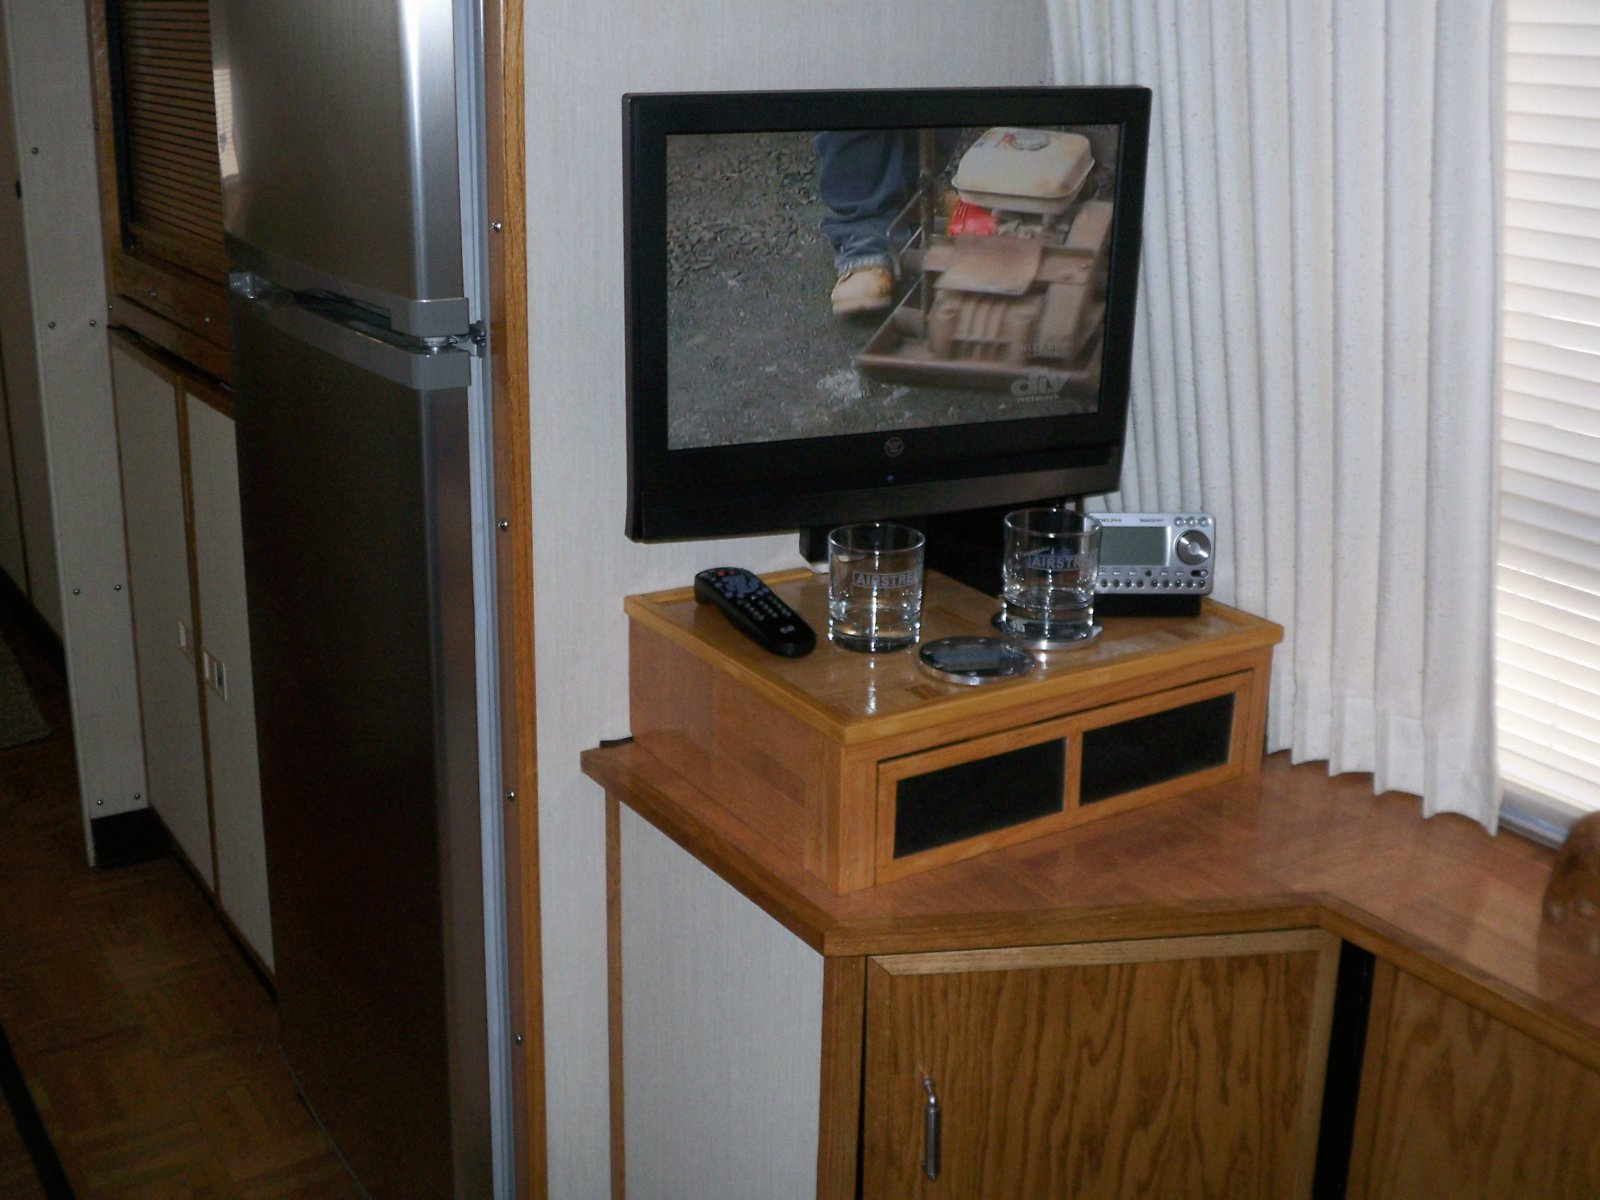 Click image for larger version  Name:TV-setup1.jpg Views:51 Size:241.6 KB ID:100617